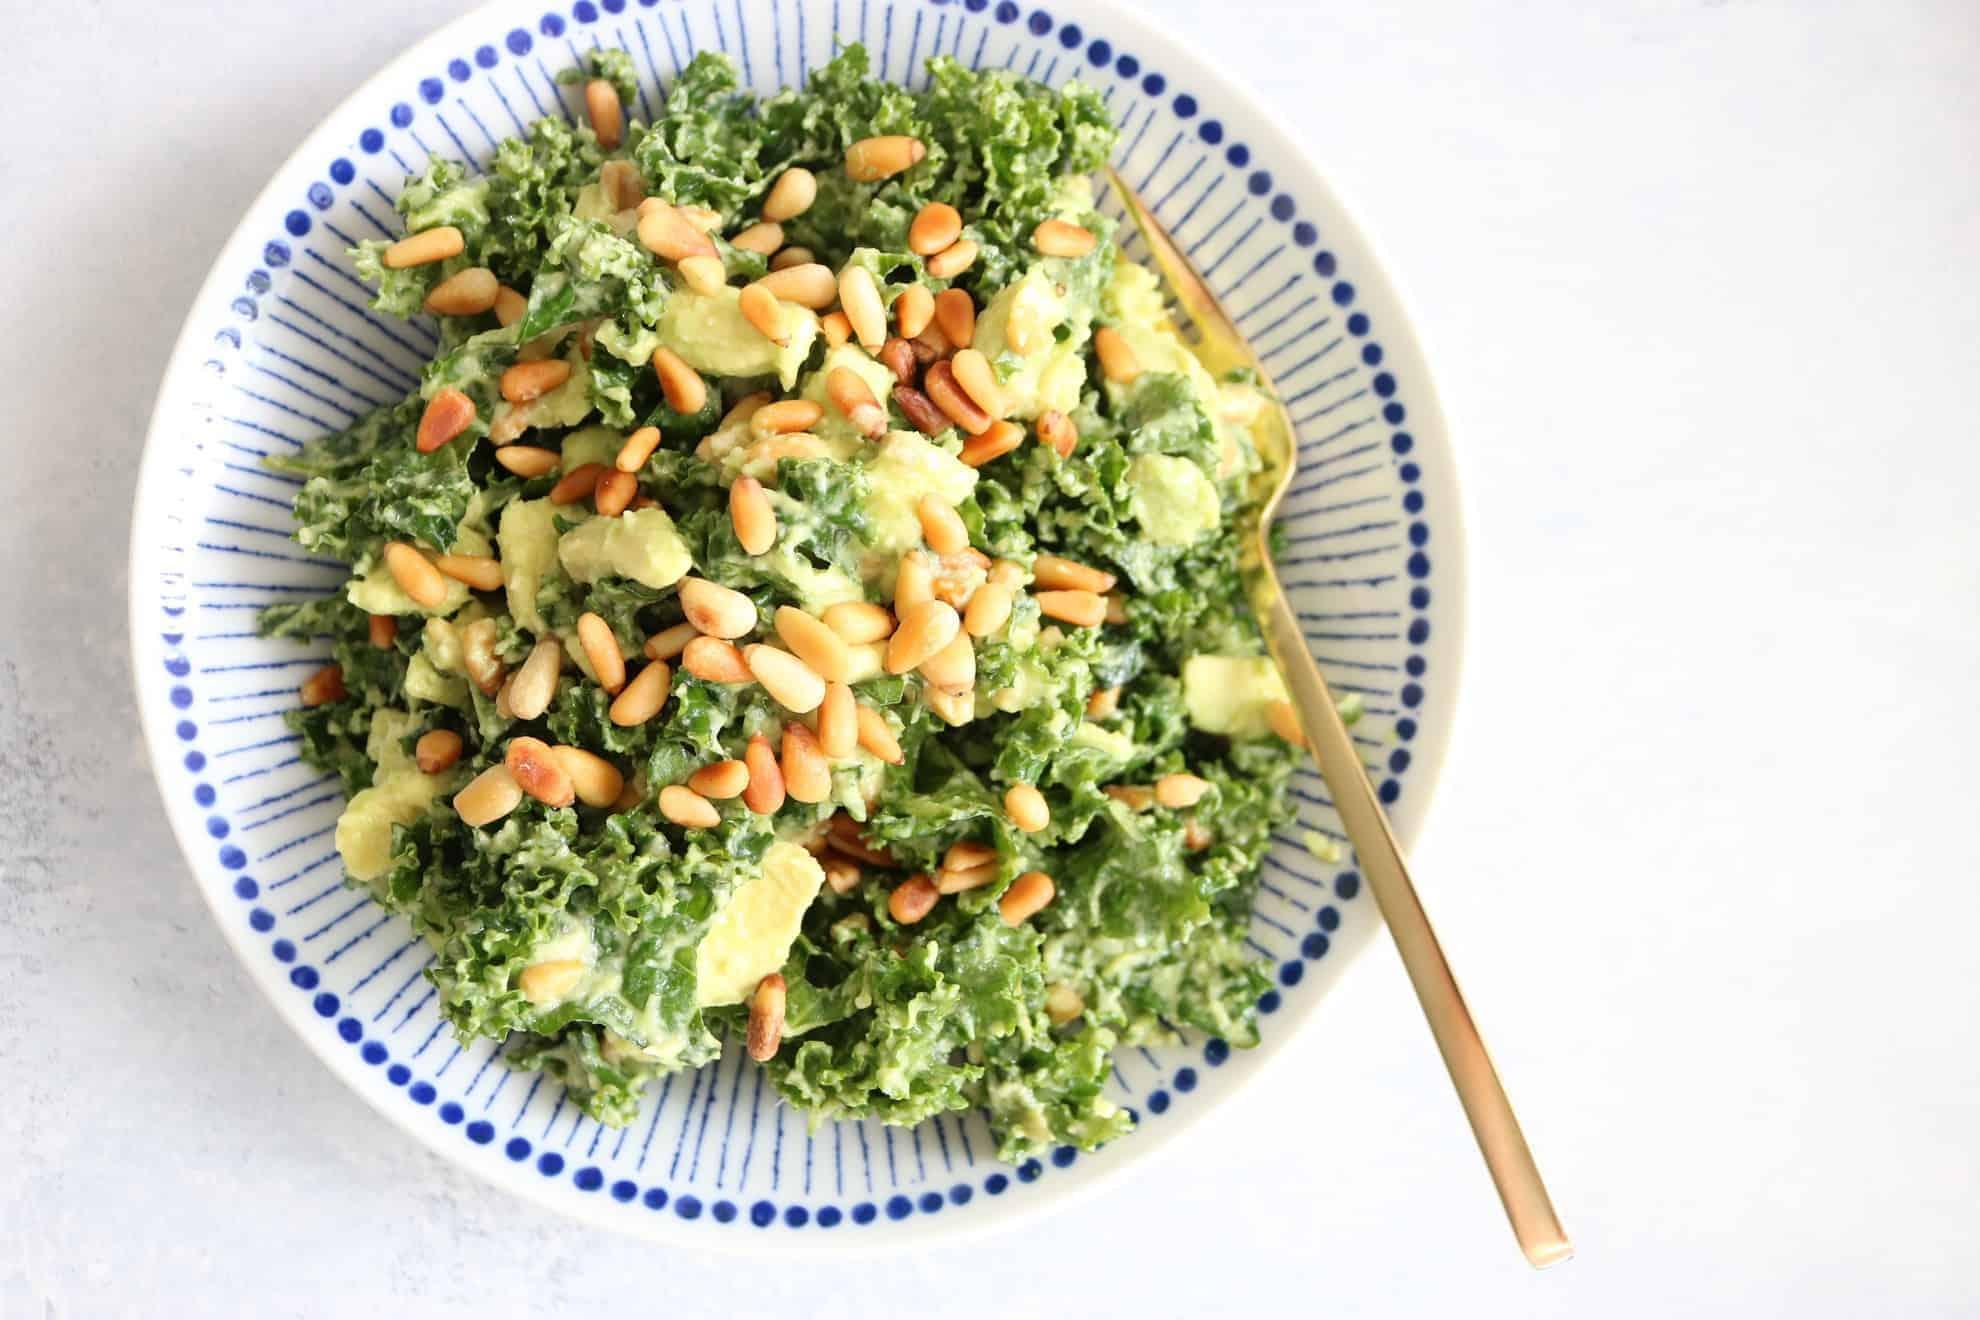 Lemon + Avocado Kale Salad